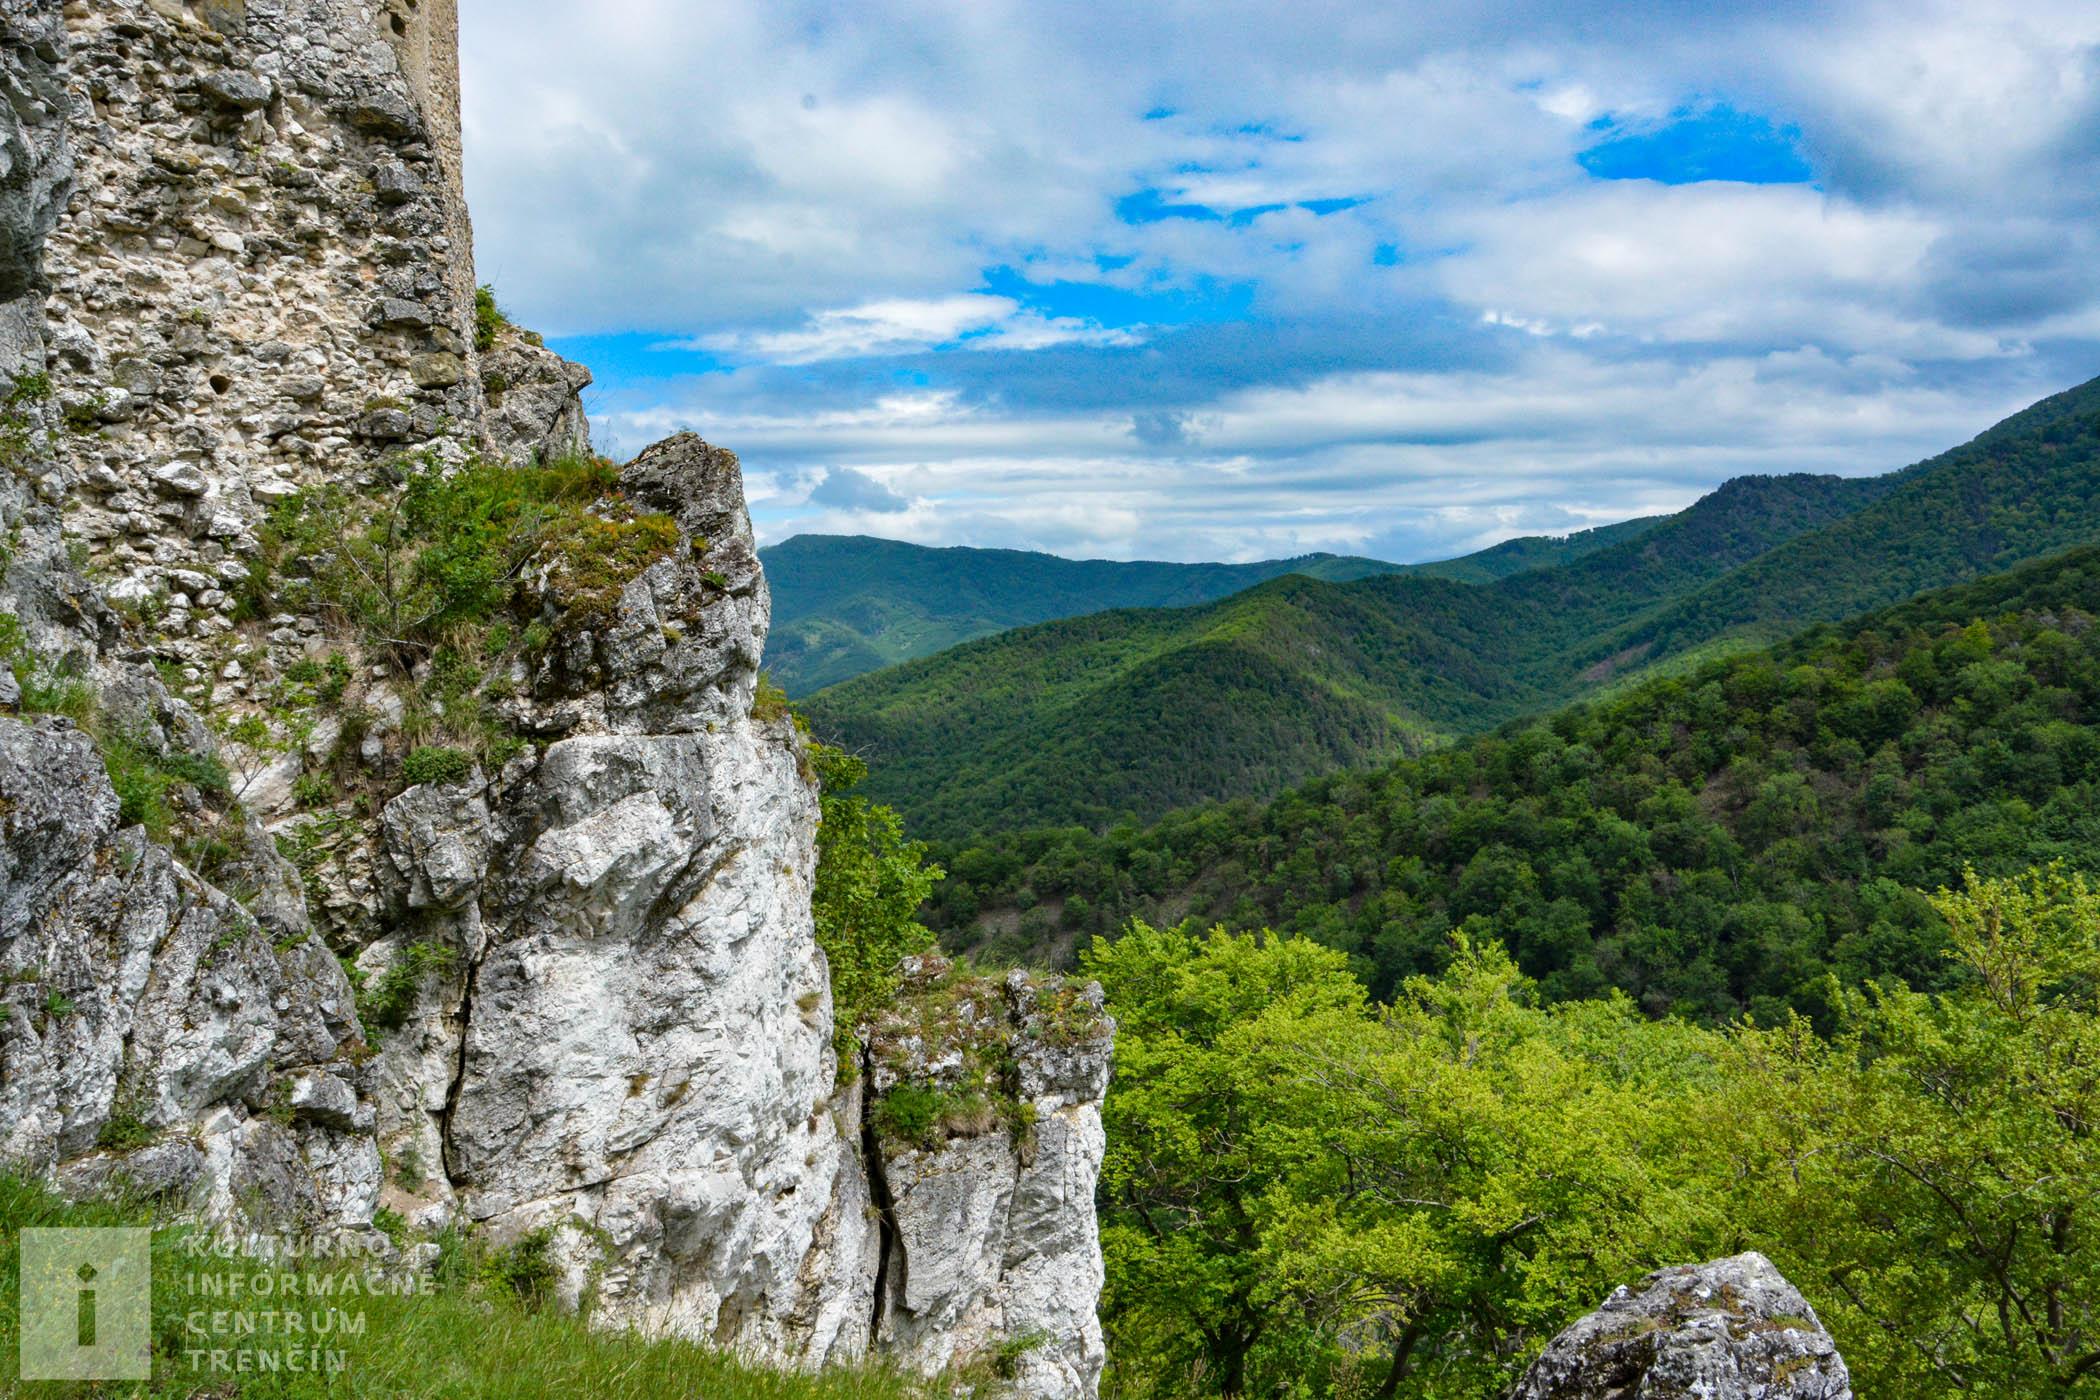 Hrad Uhrovec/Uhrovec Castle